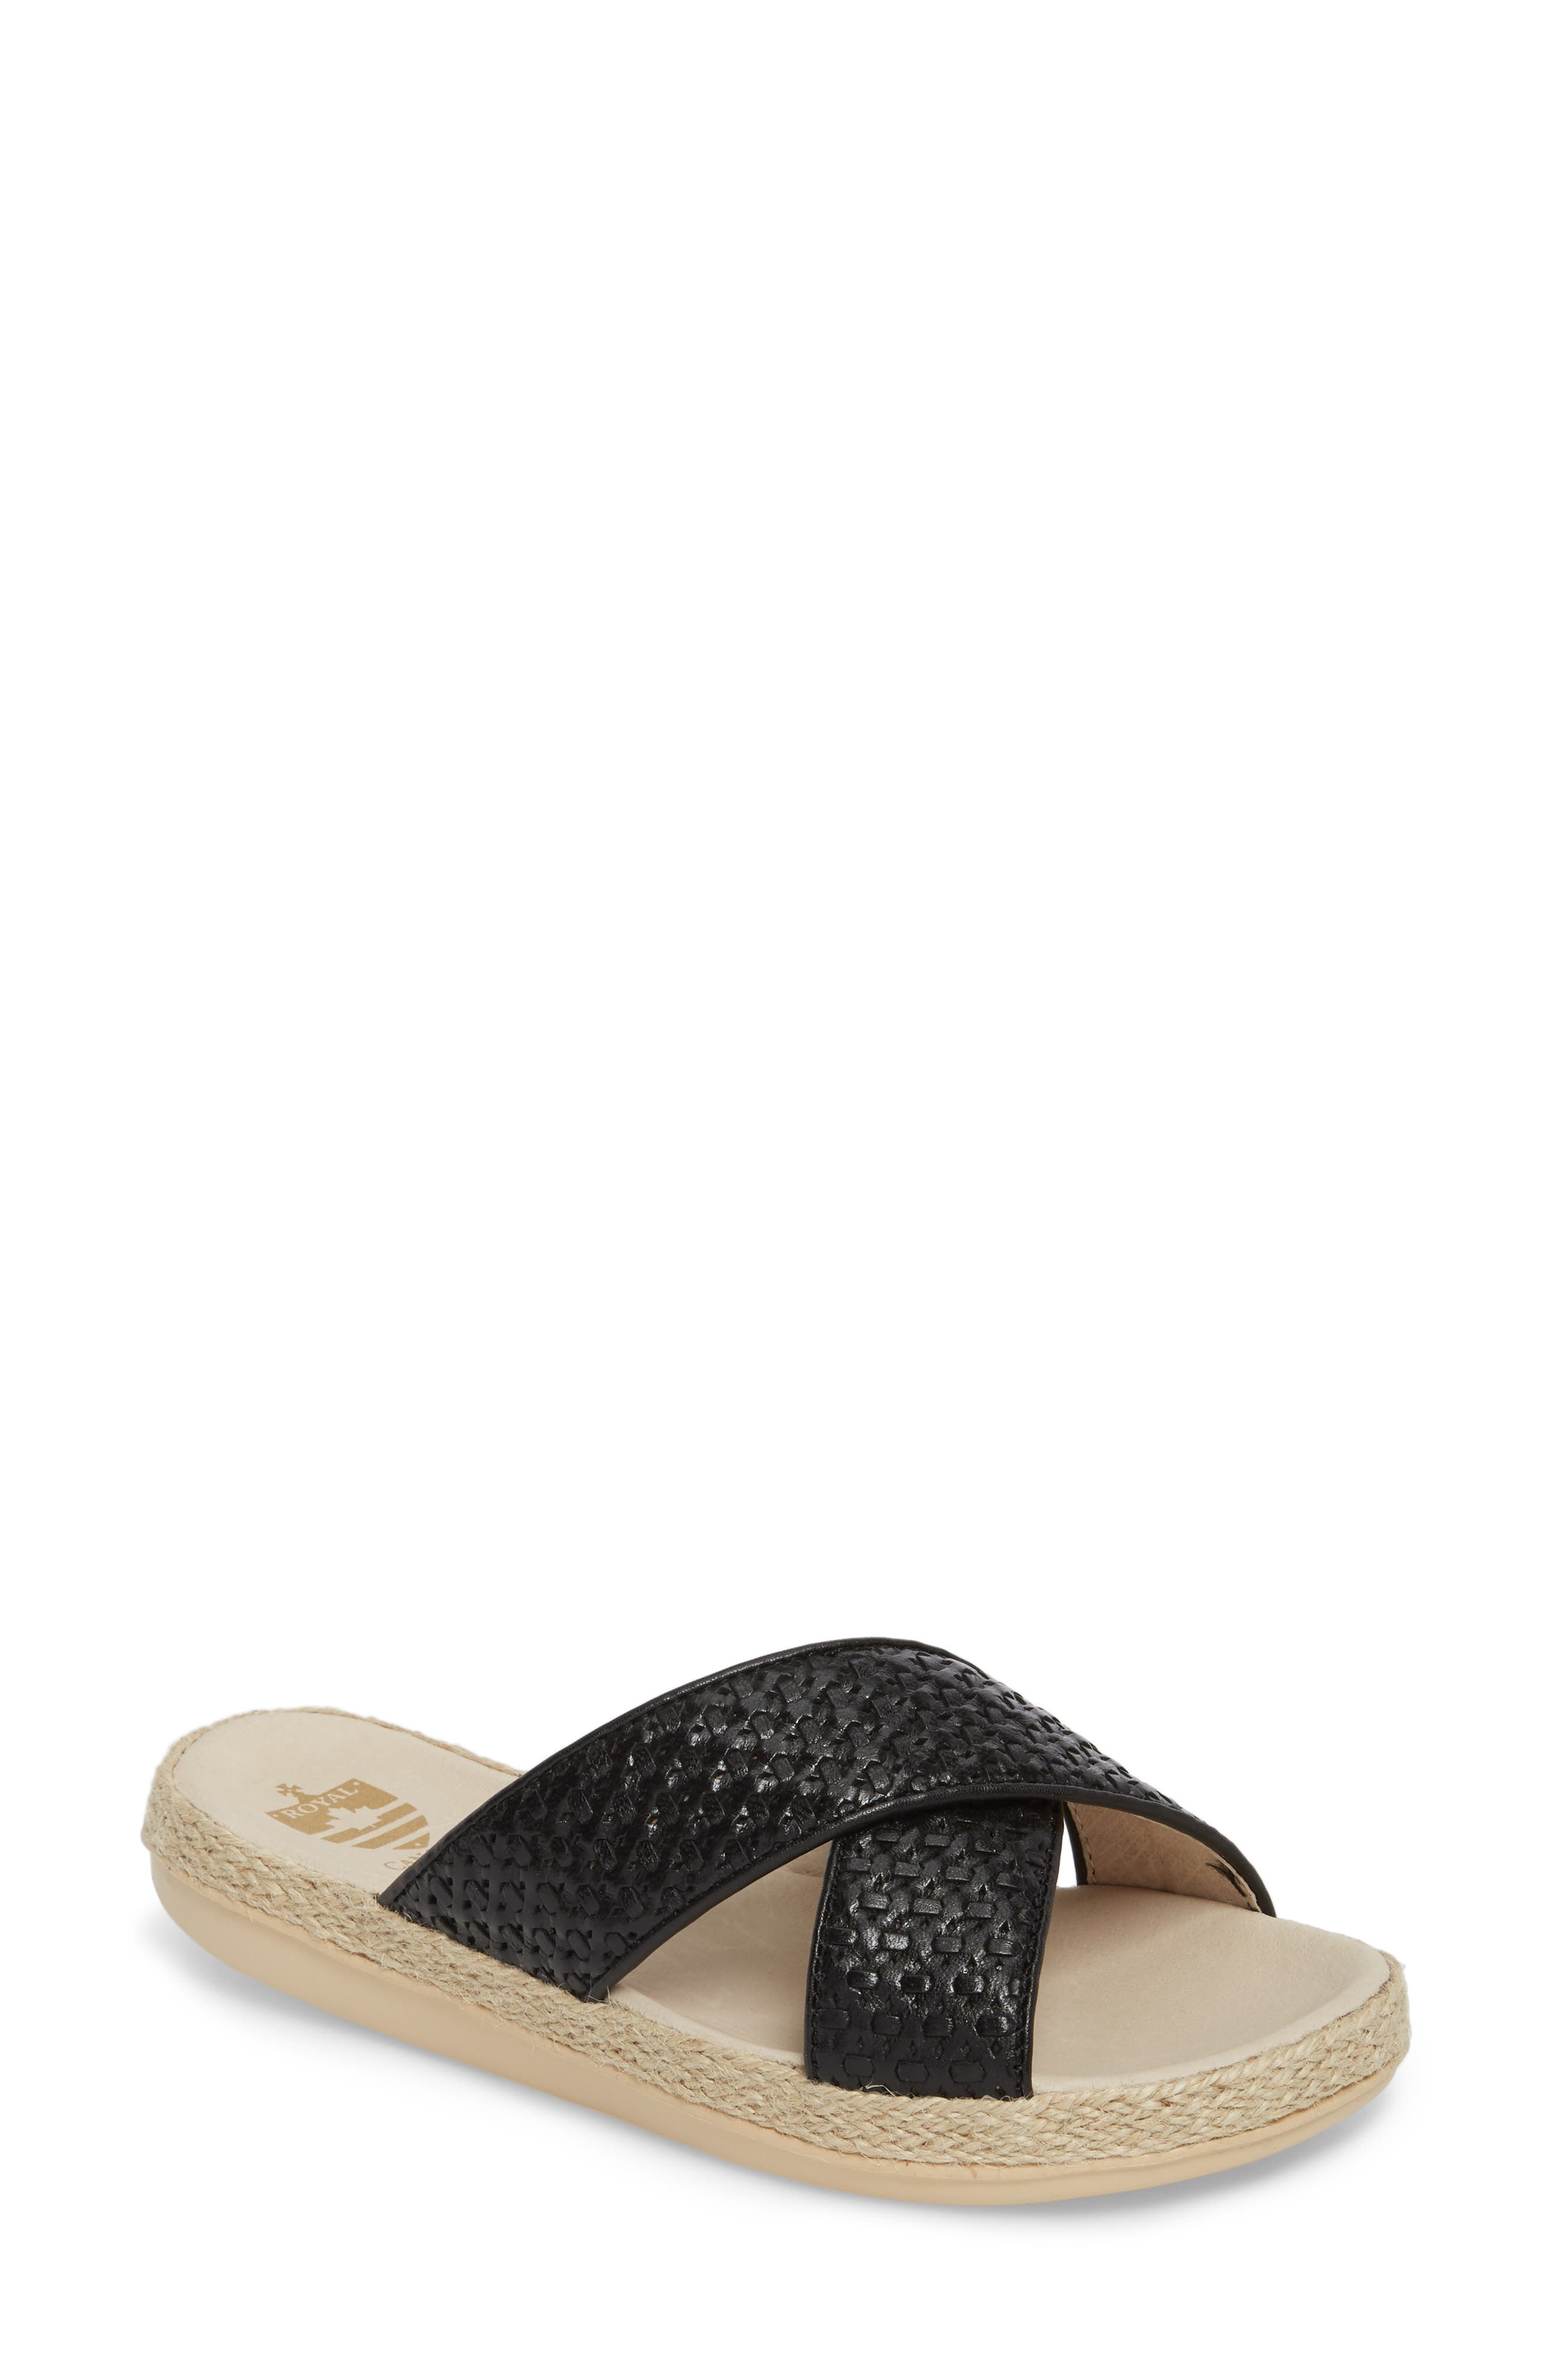 Glencairn Sandal,                             Main thumbnail 1, color,                             BLACK LEATHER